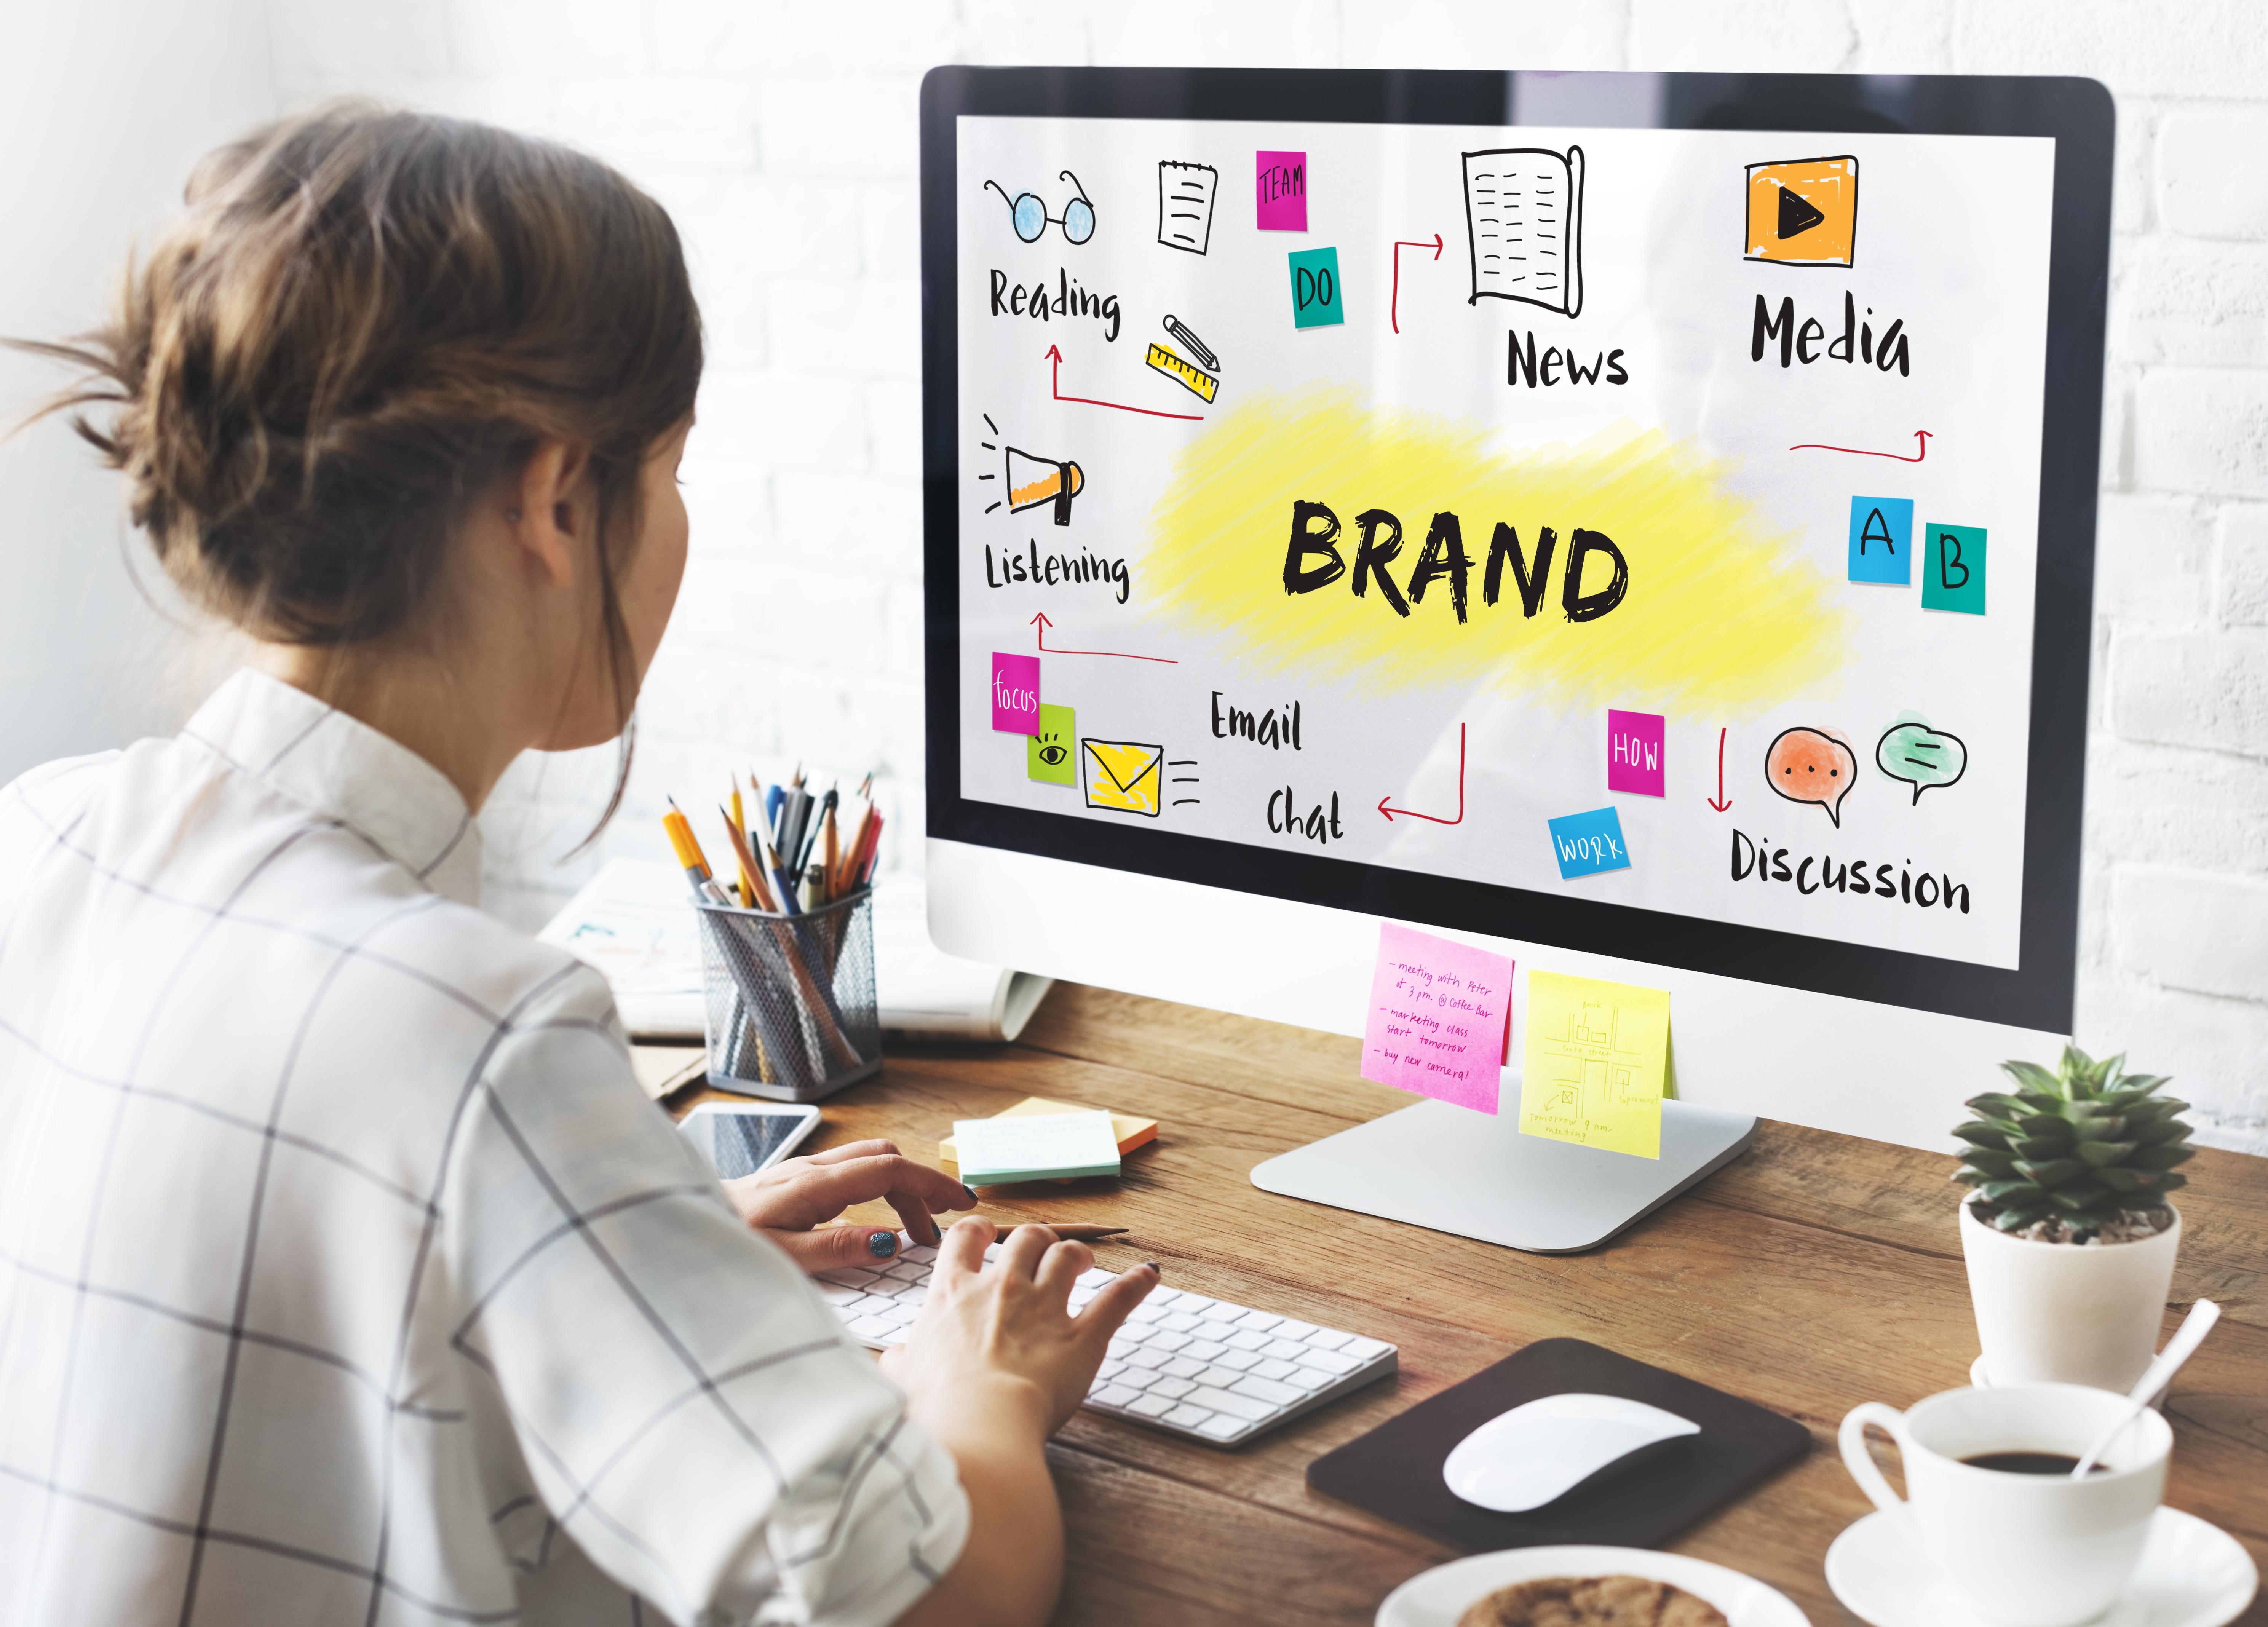 bigstock-Brand-Social-Media-Networking--151963979